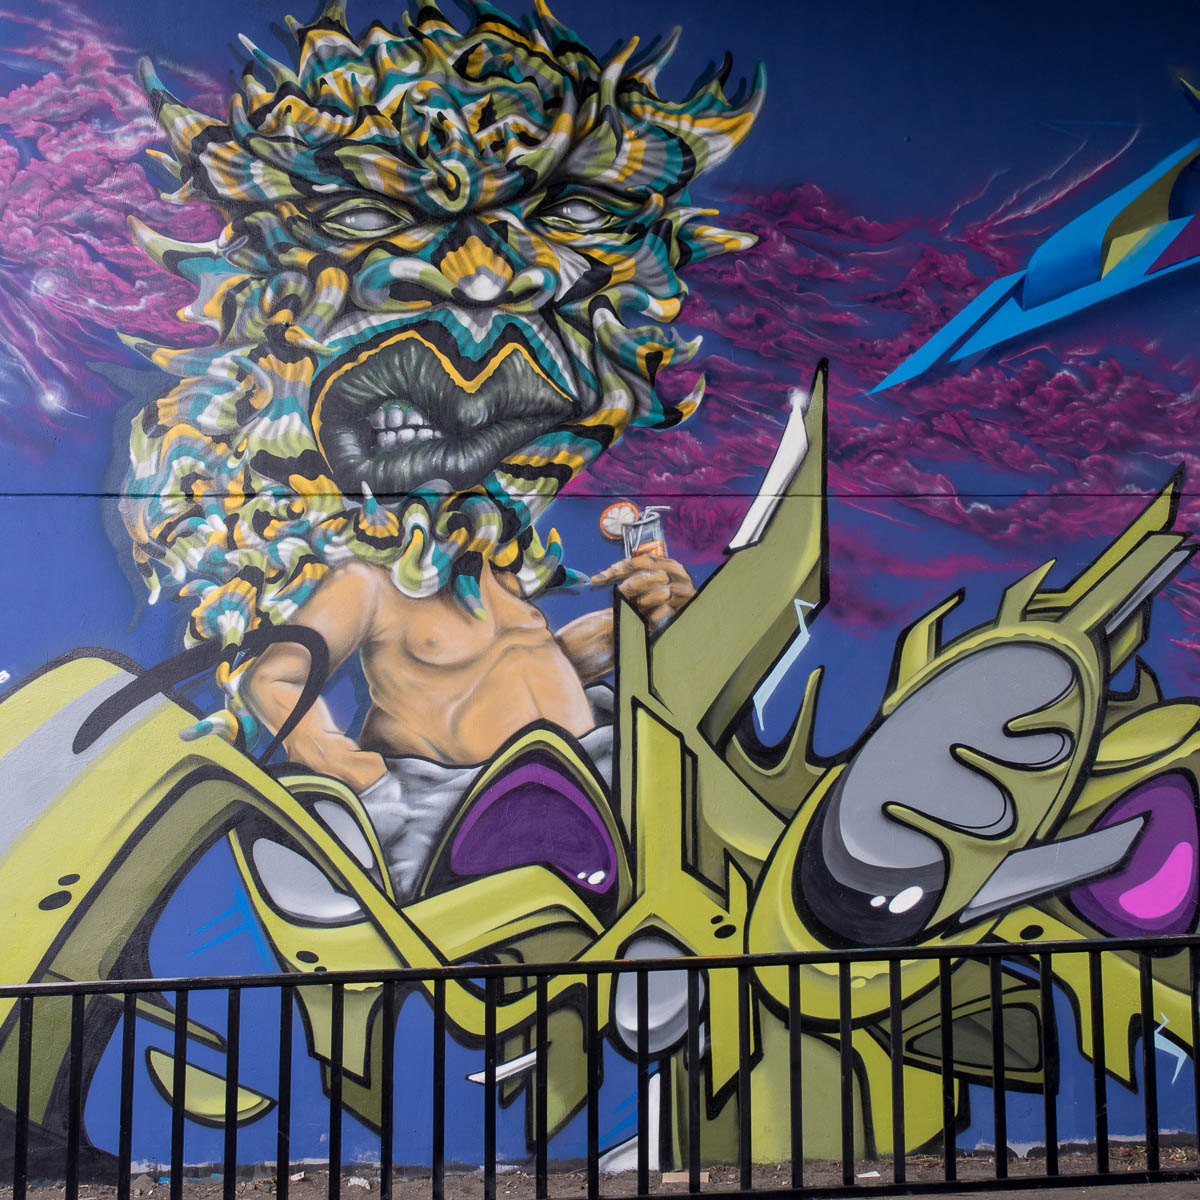 2015-06-18 EM1 Graffiti Mainz-Kastel MOS 2015 0234